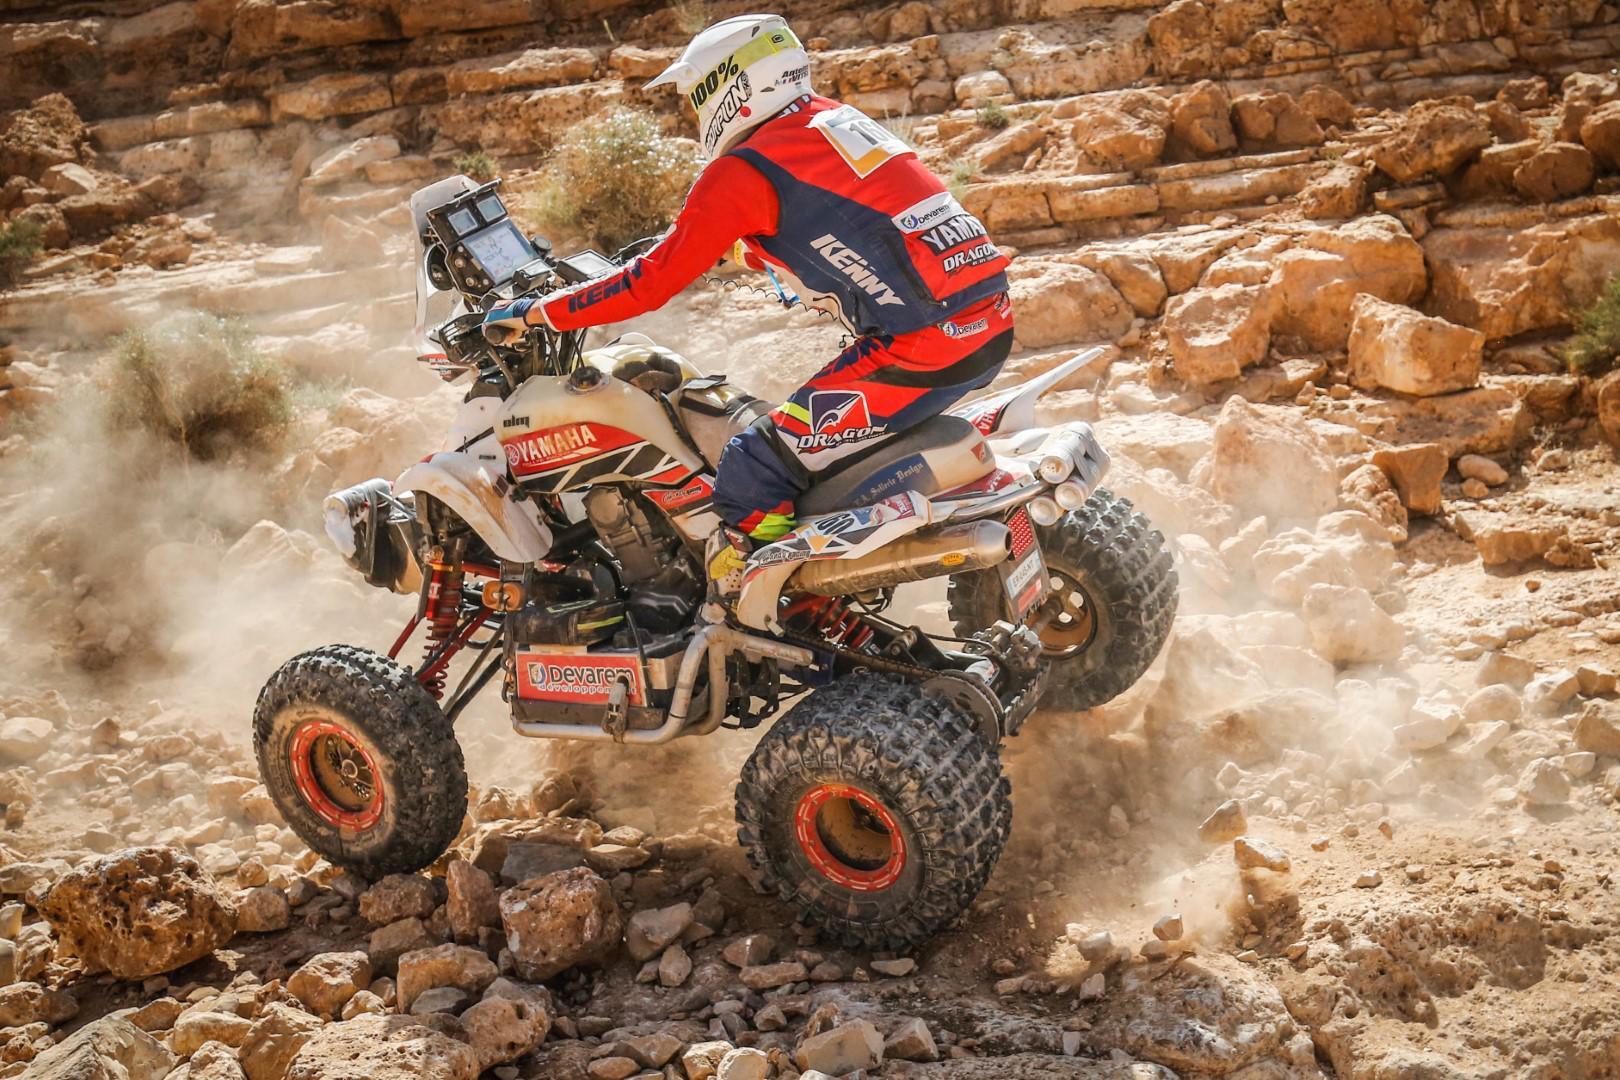 afriquia-merzouga-rally-la-surprise-botturi-752-1.jpg